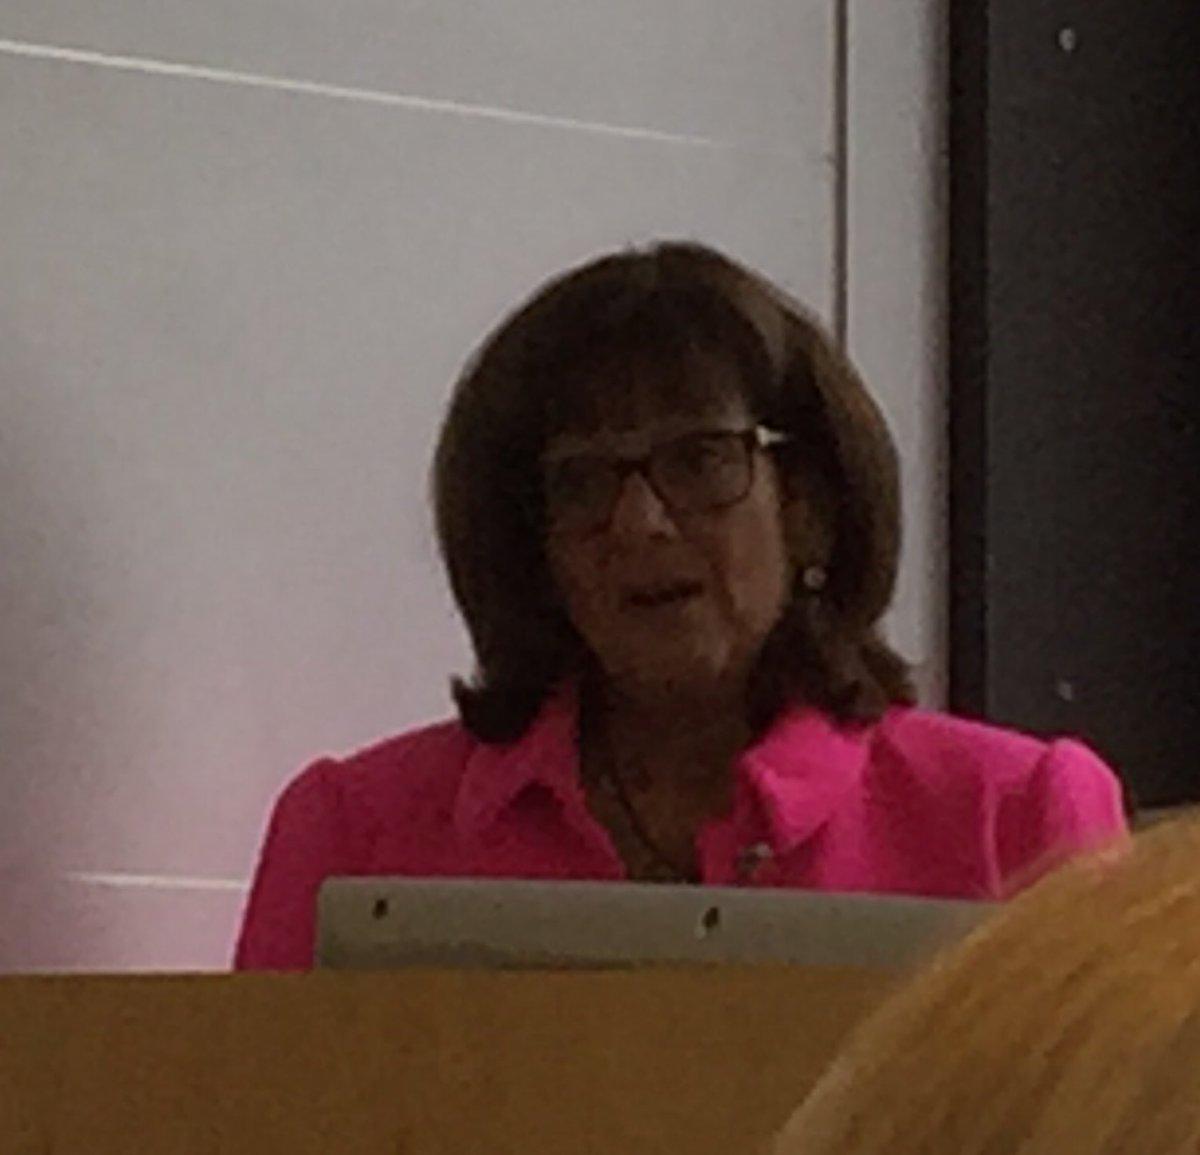 .@rosaltmann addressing @AgeBITC senior business leaders on opportunity of supporting older workers @Ageing_Better https://t.co/n54va2gqen